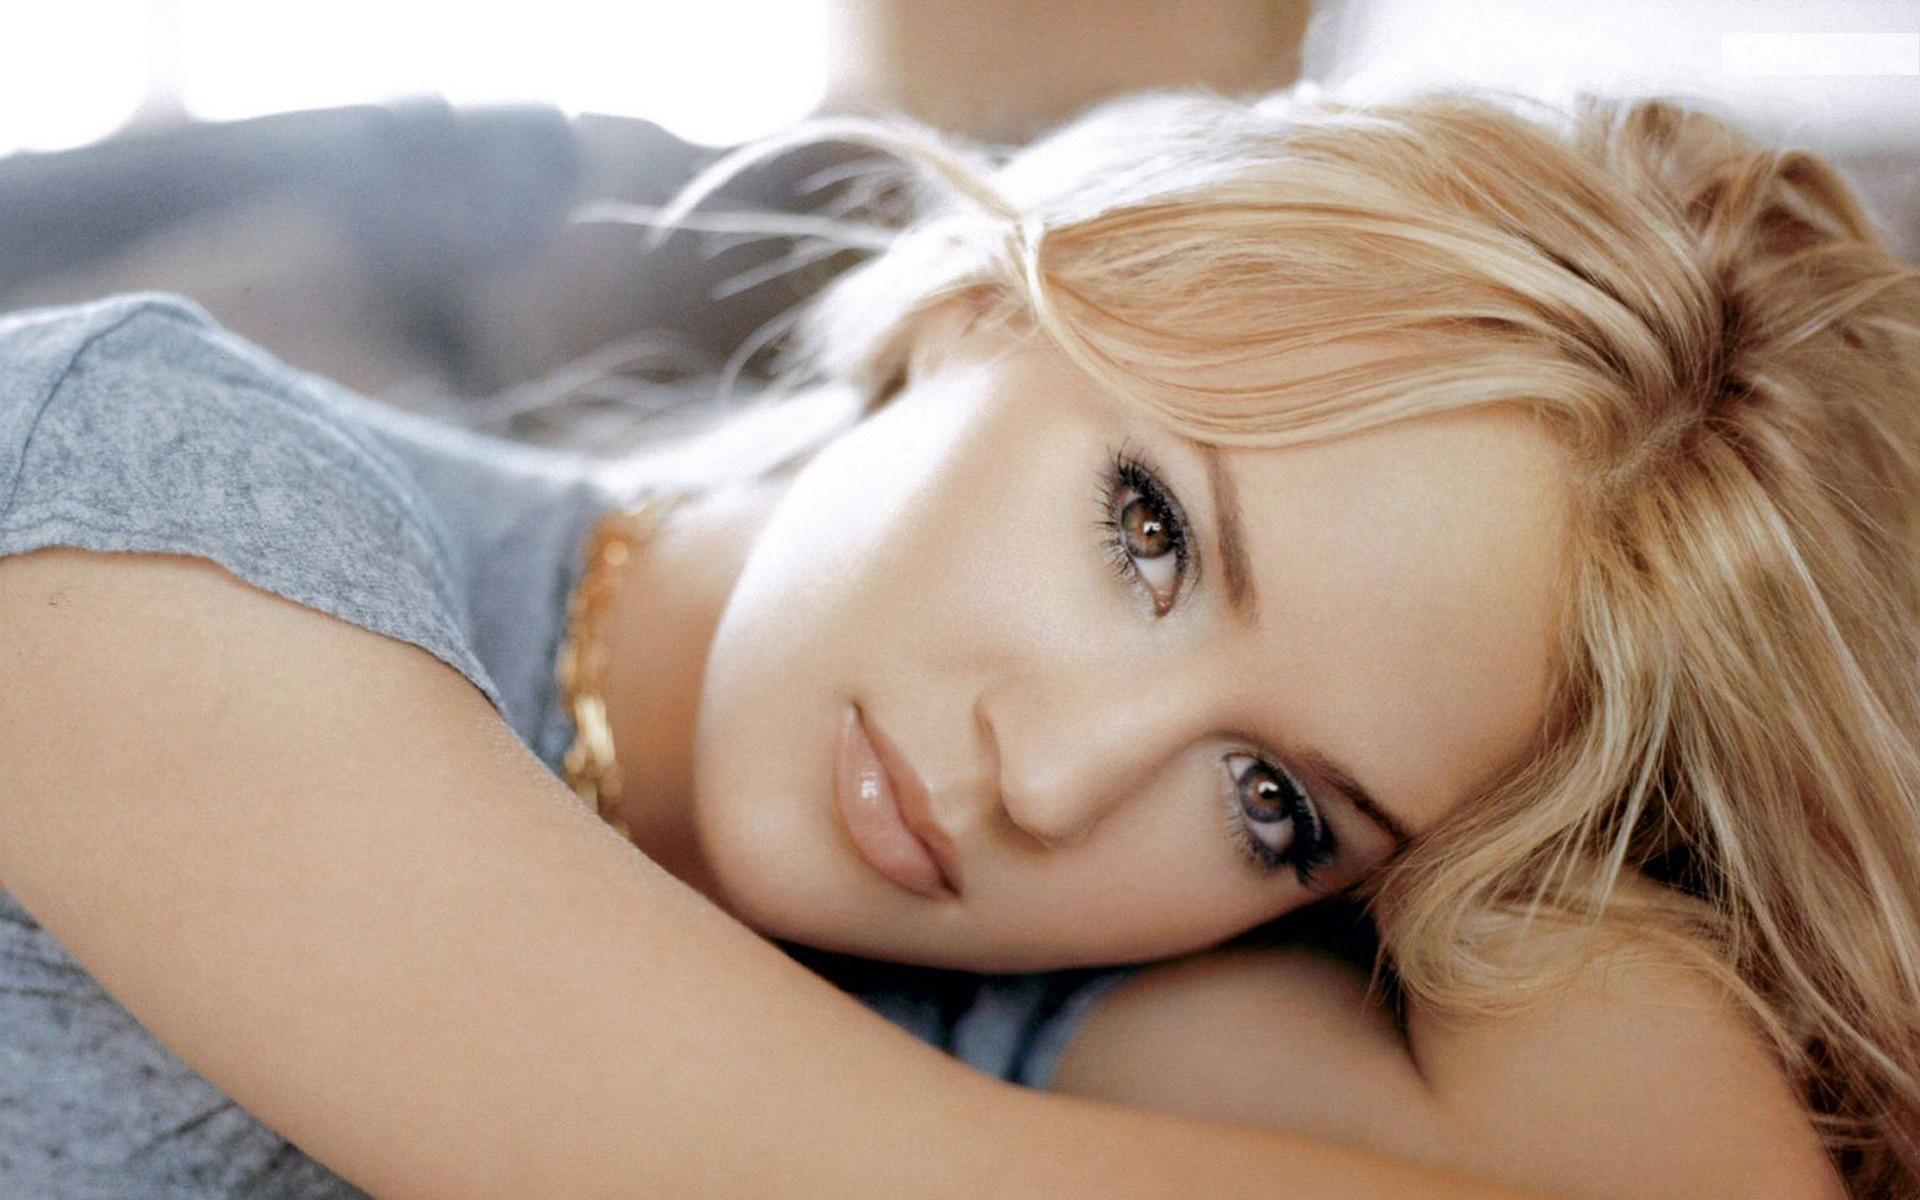 Nude carrie underwood Carrie Underwood: